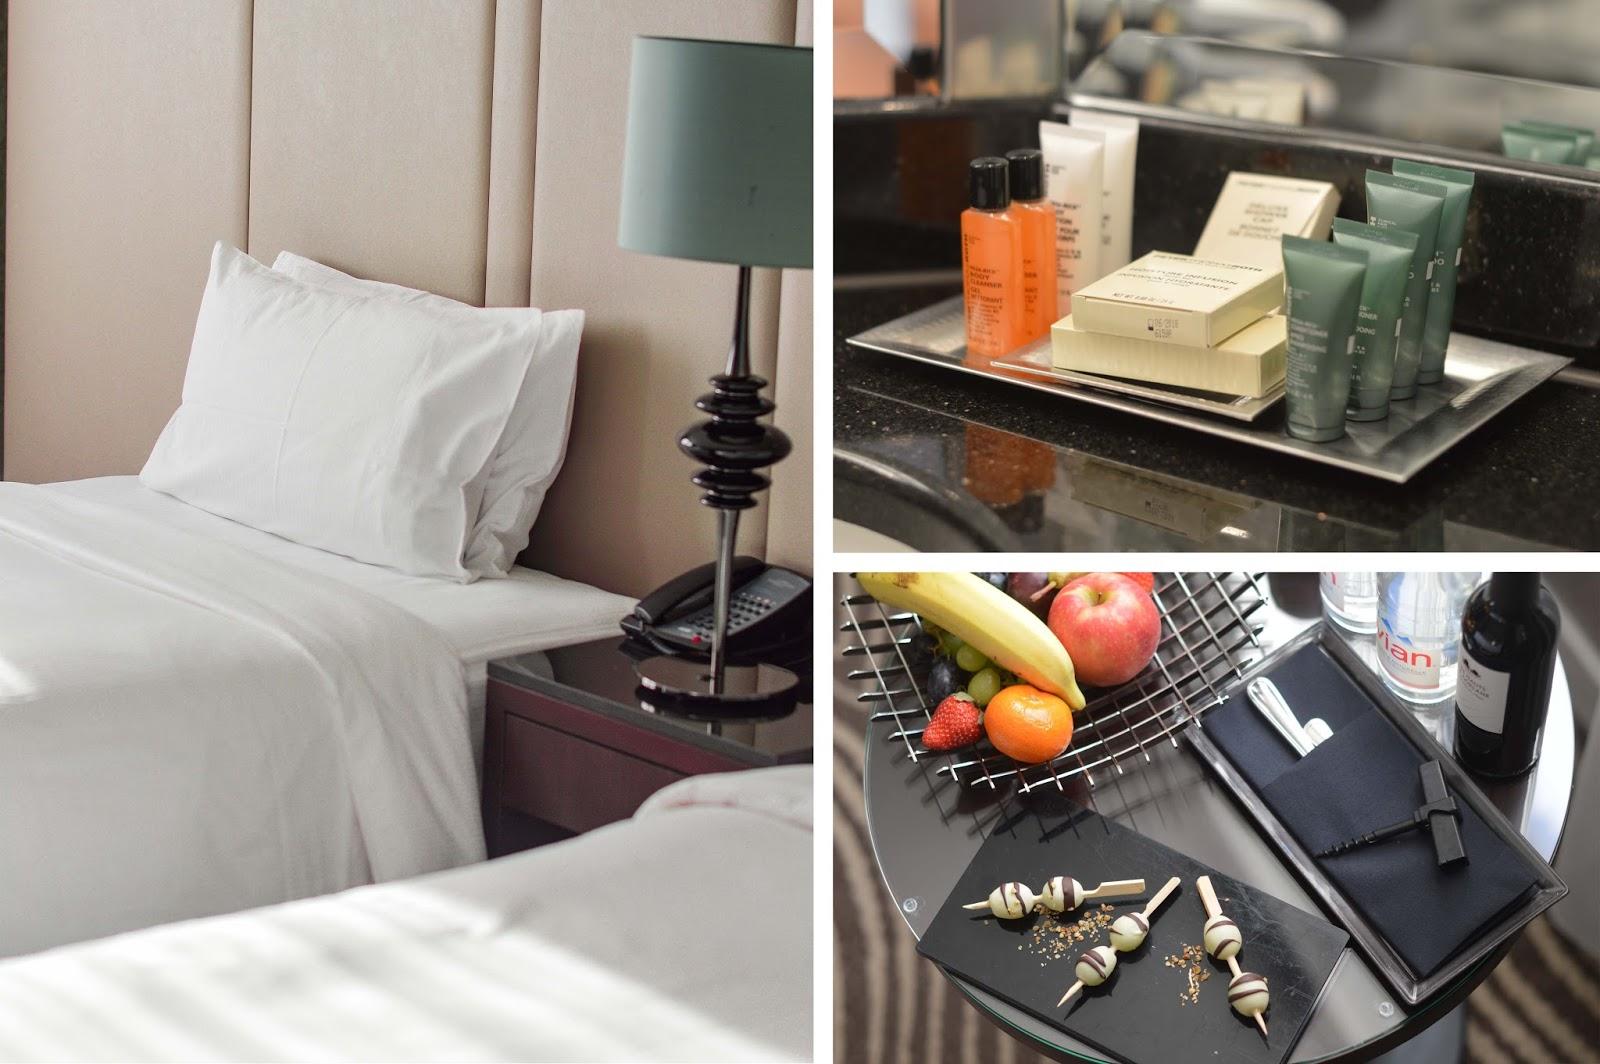 Wo-fahre-ich-ins-hotel-top-hotel-berlin-beste-hotels-in-berlin-hilton-berlin-hiltonhotel-berlin-fashionblogger-reiseblogger-travelblogger